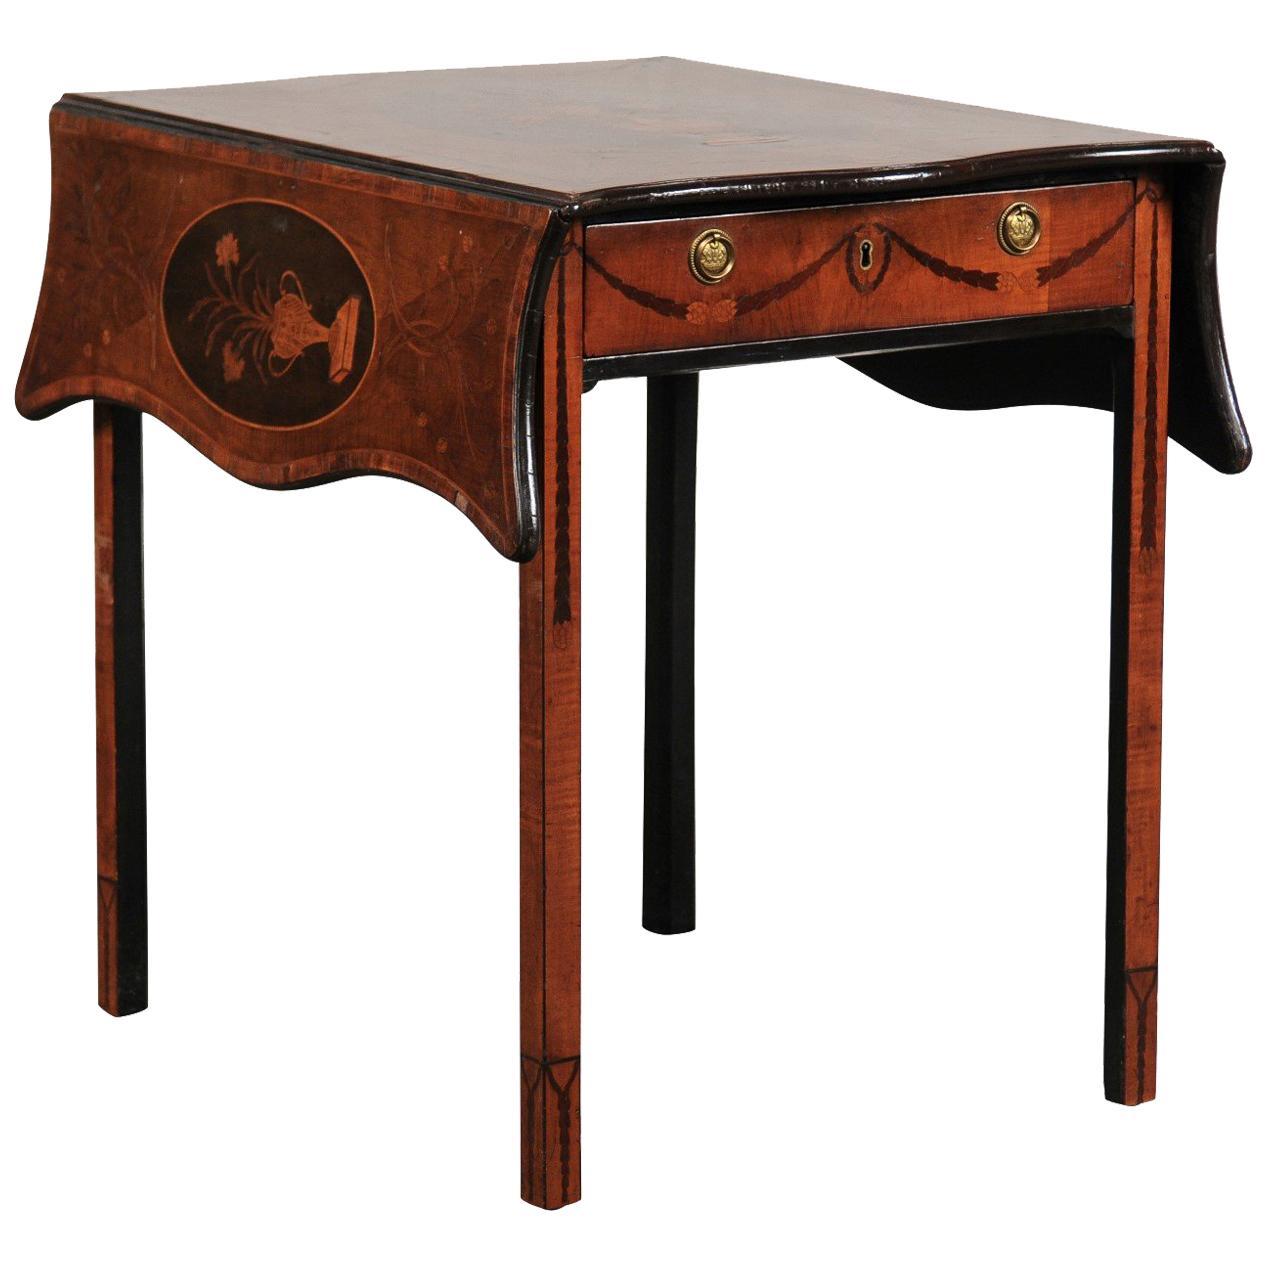 18th-19th Century English George III Mahogany Inlaid Pembroke Table